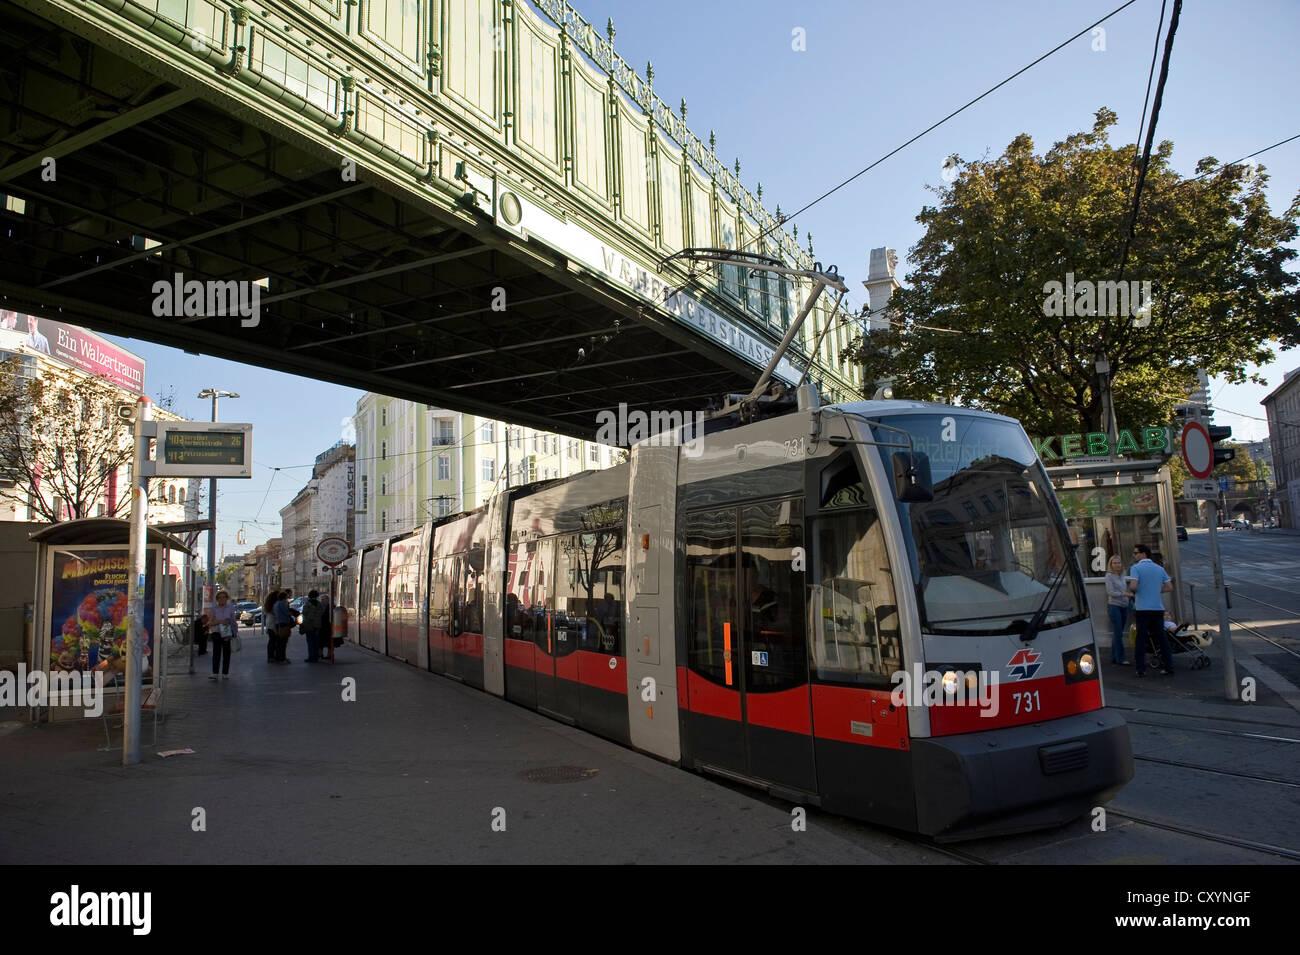 Electric Tram beneath a rail bridge at Wahringer Strasse, Vienna, Austria. Stock Photo